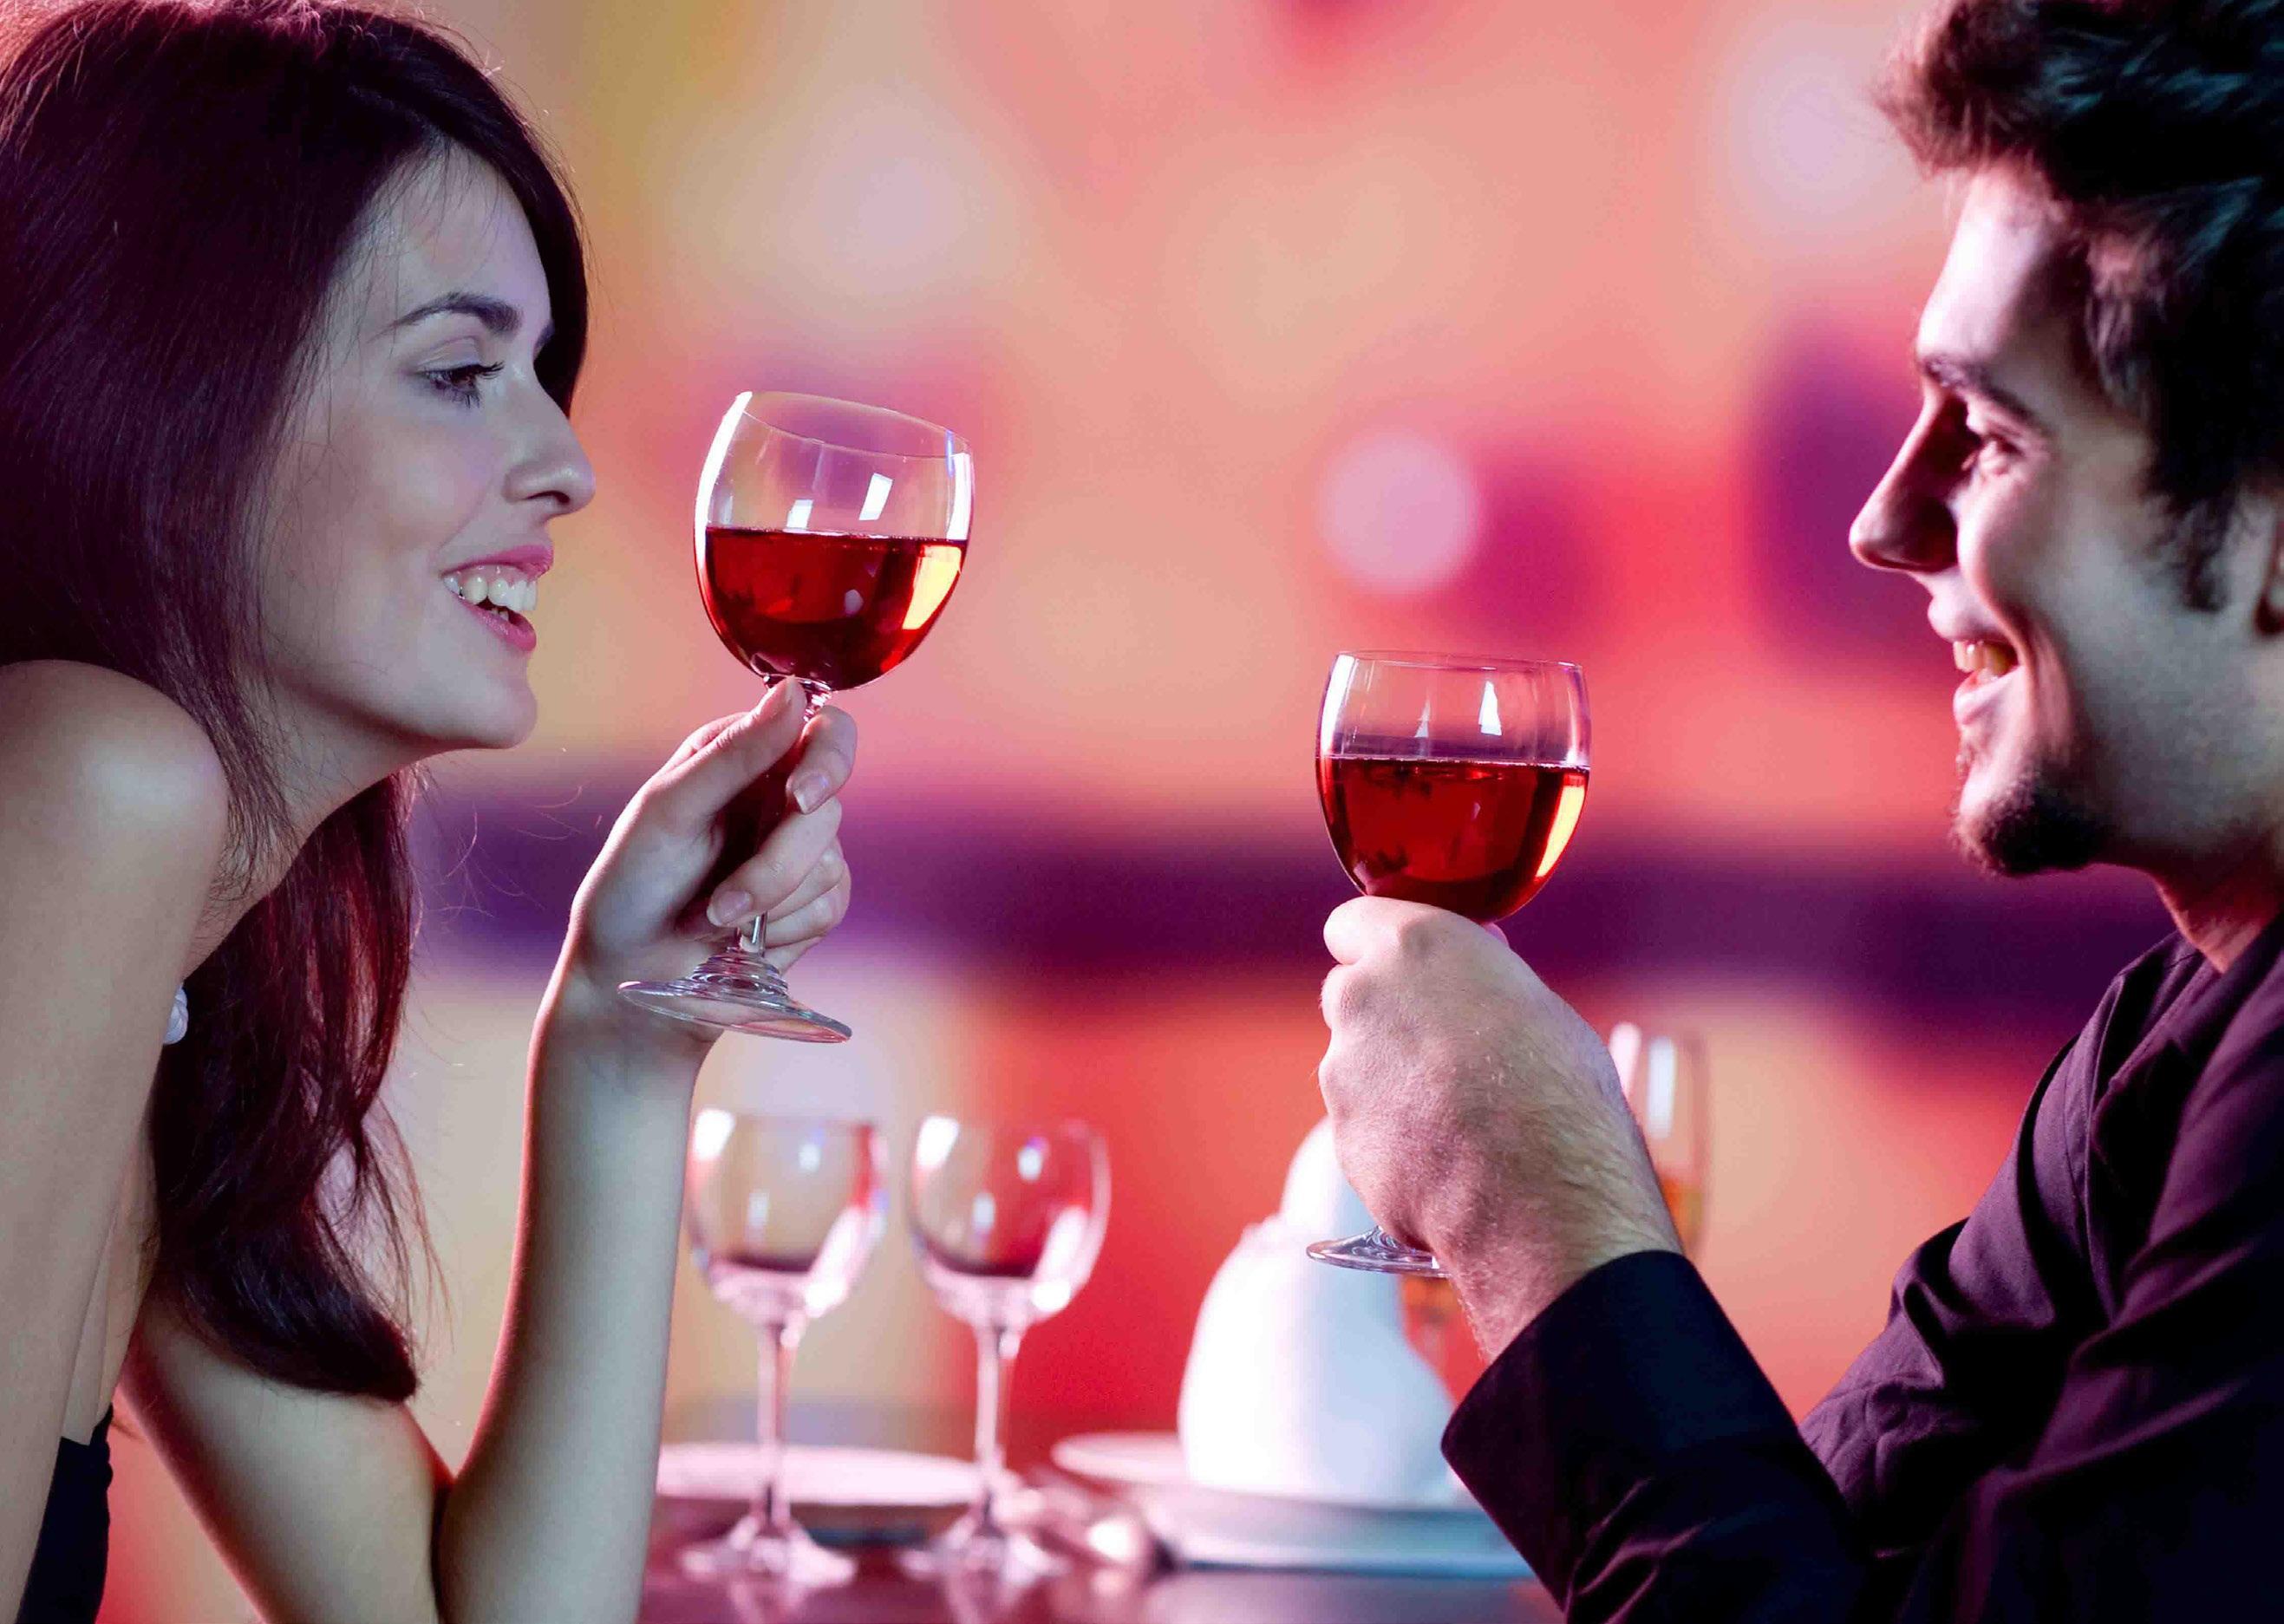 happy date